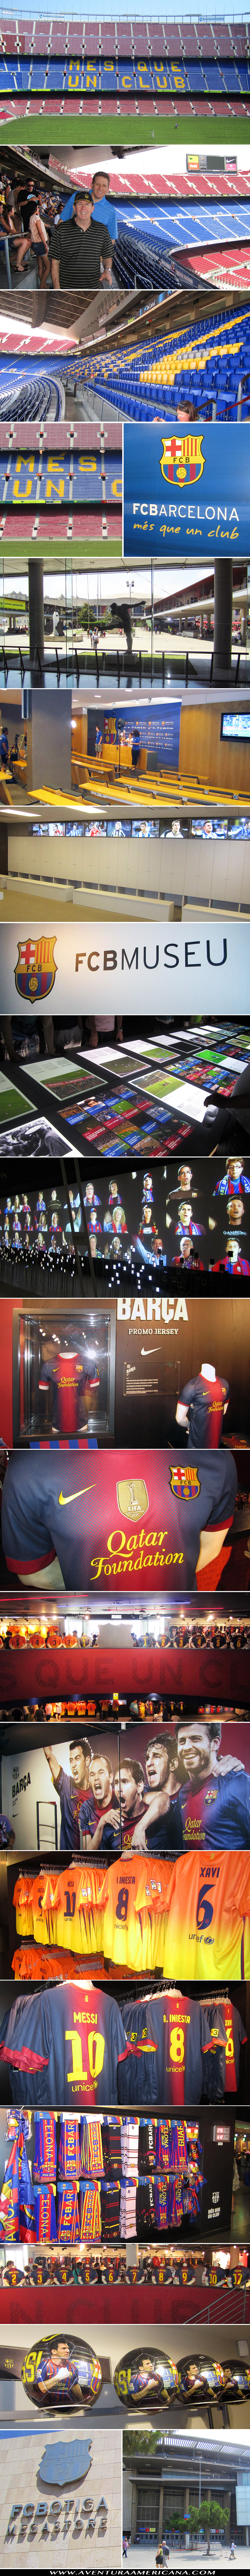 Museo Barcelona 02